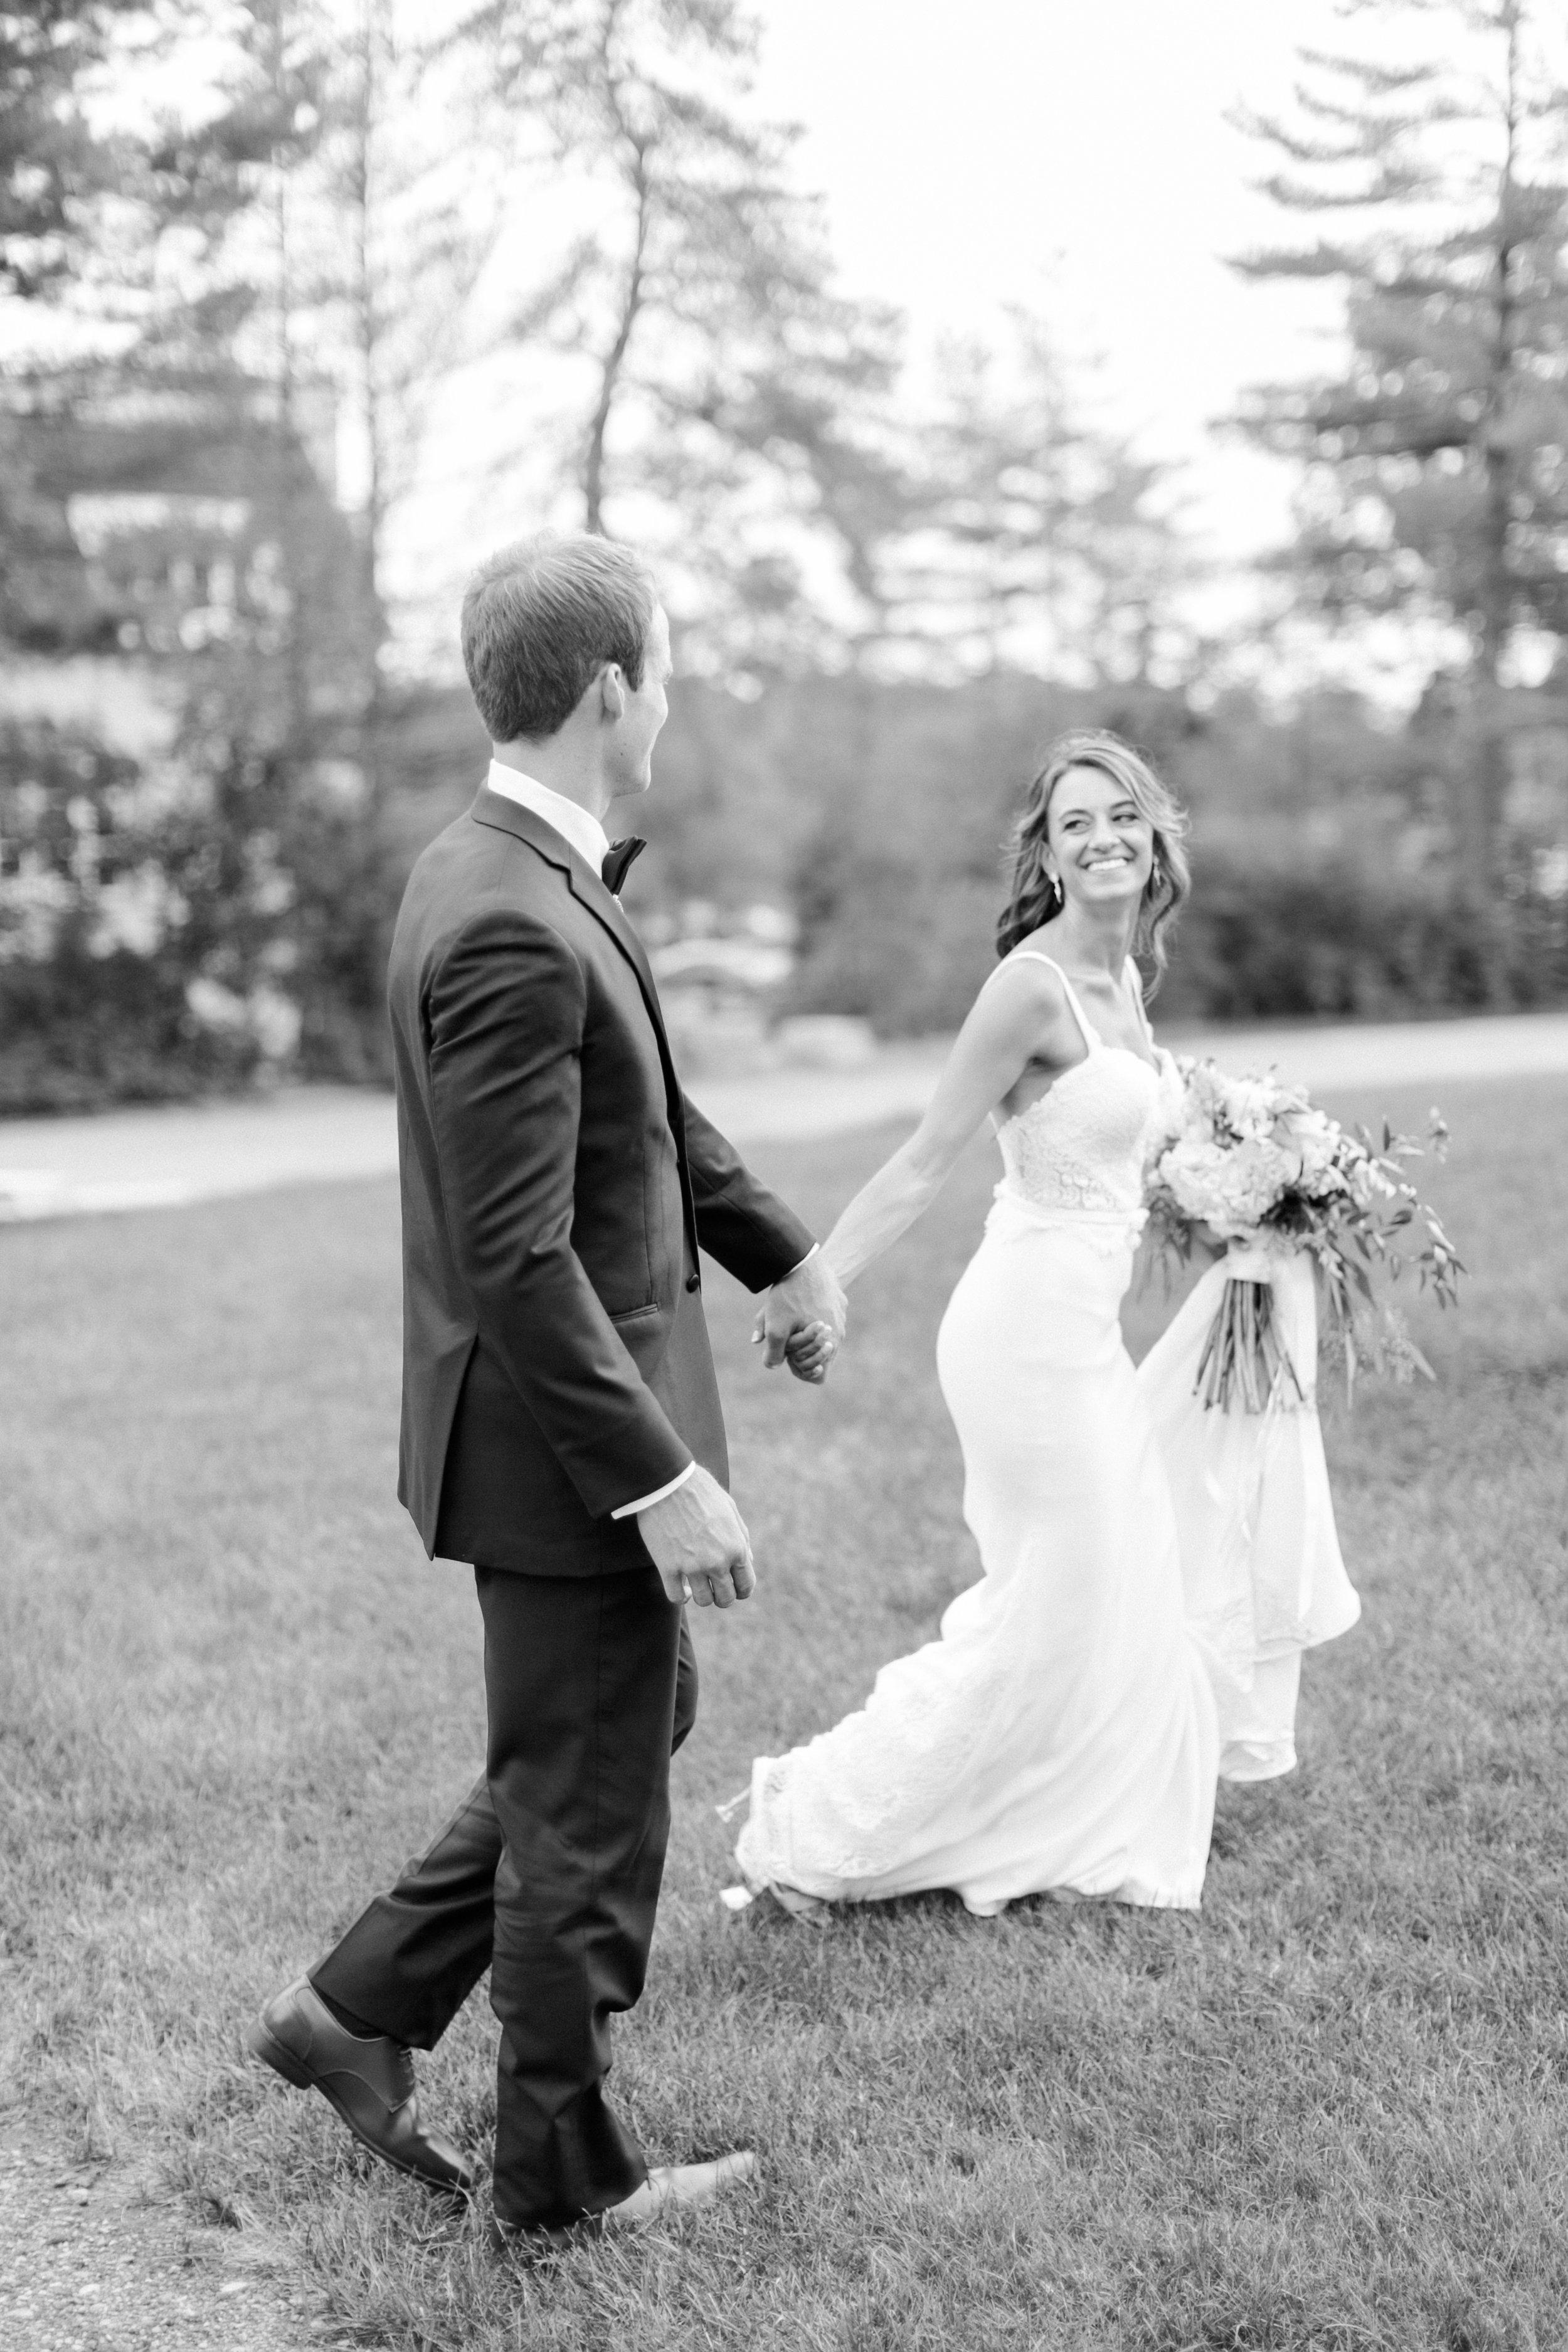 best-toronto-wedding-photographer-langdon-hall-eagles-nest-richelle-hunter-paris-france-olivia-mark-736.jpg